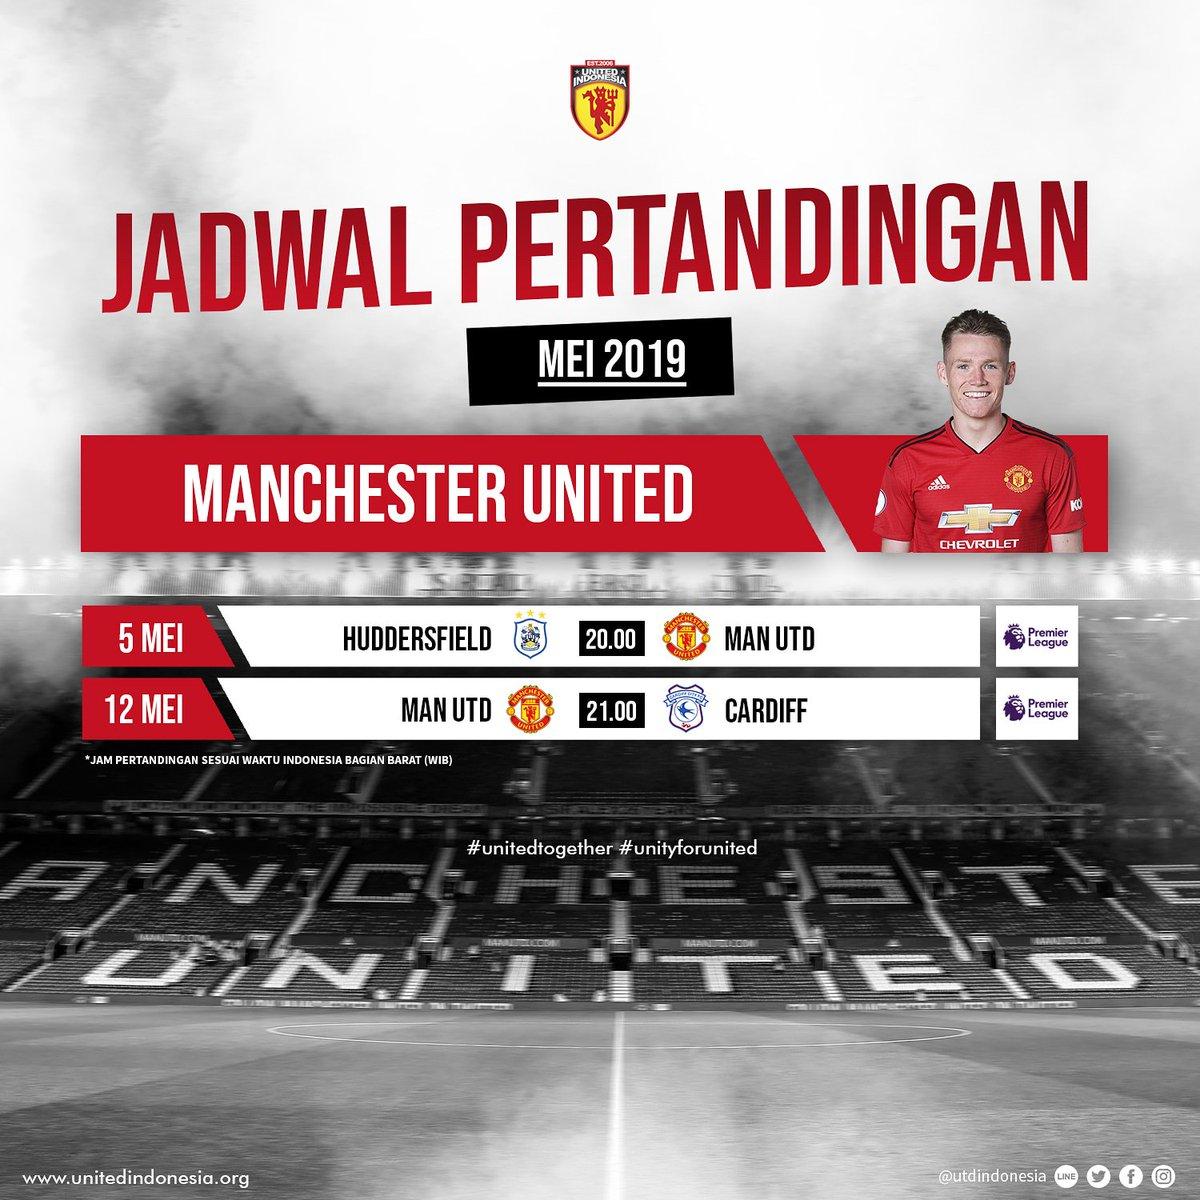 Sisa 2 pertandingan, Sikat abiss!!👊💥  #unitedindonesia #utdindonesia #unitedtogether #unityforunited #manutd #manchesterunited #mufc #mufcfans #mufcfanspict #forunited